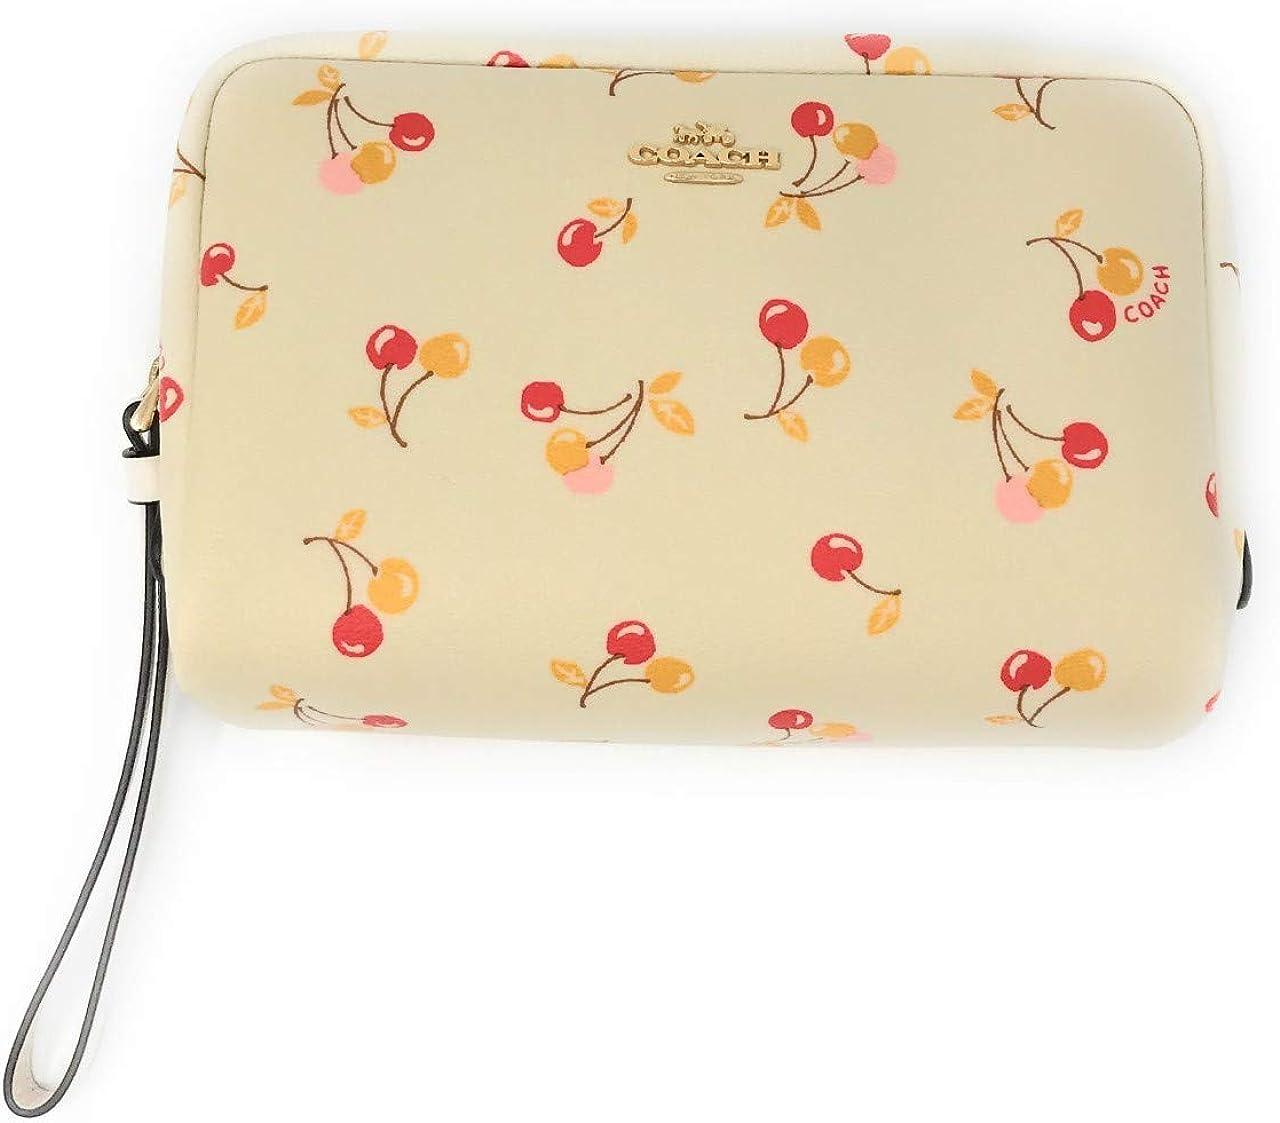 Coach F31909 Cherry Print Cosmetic Makeup Case 20 Travel Bag Chalk